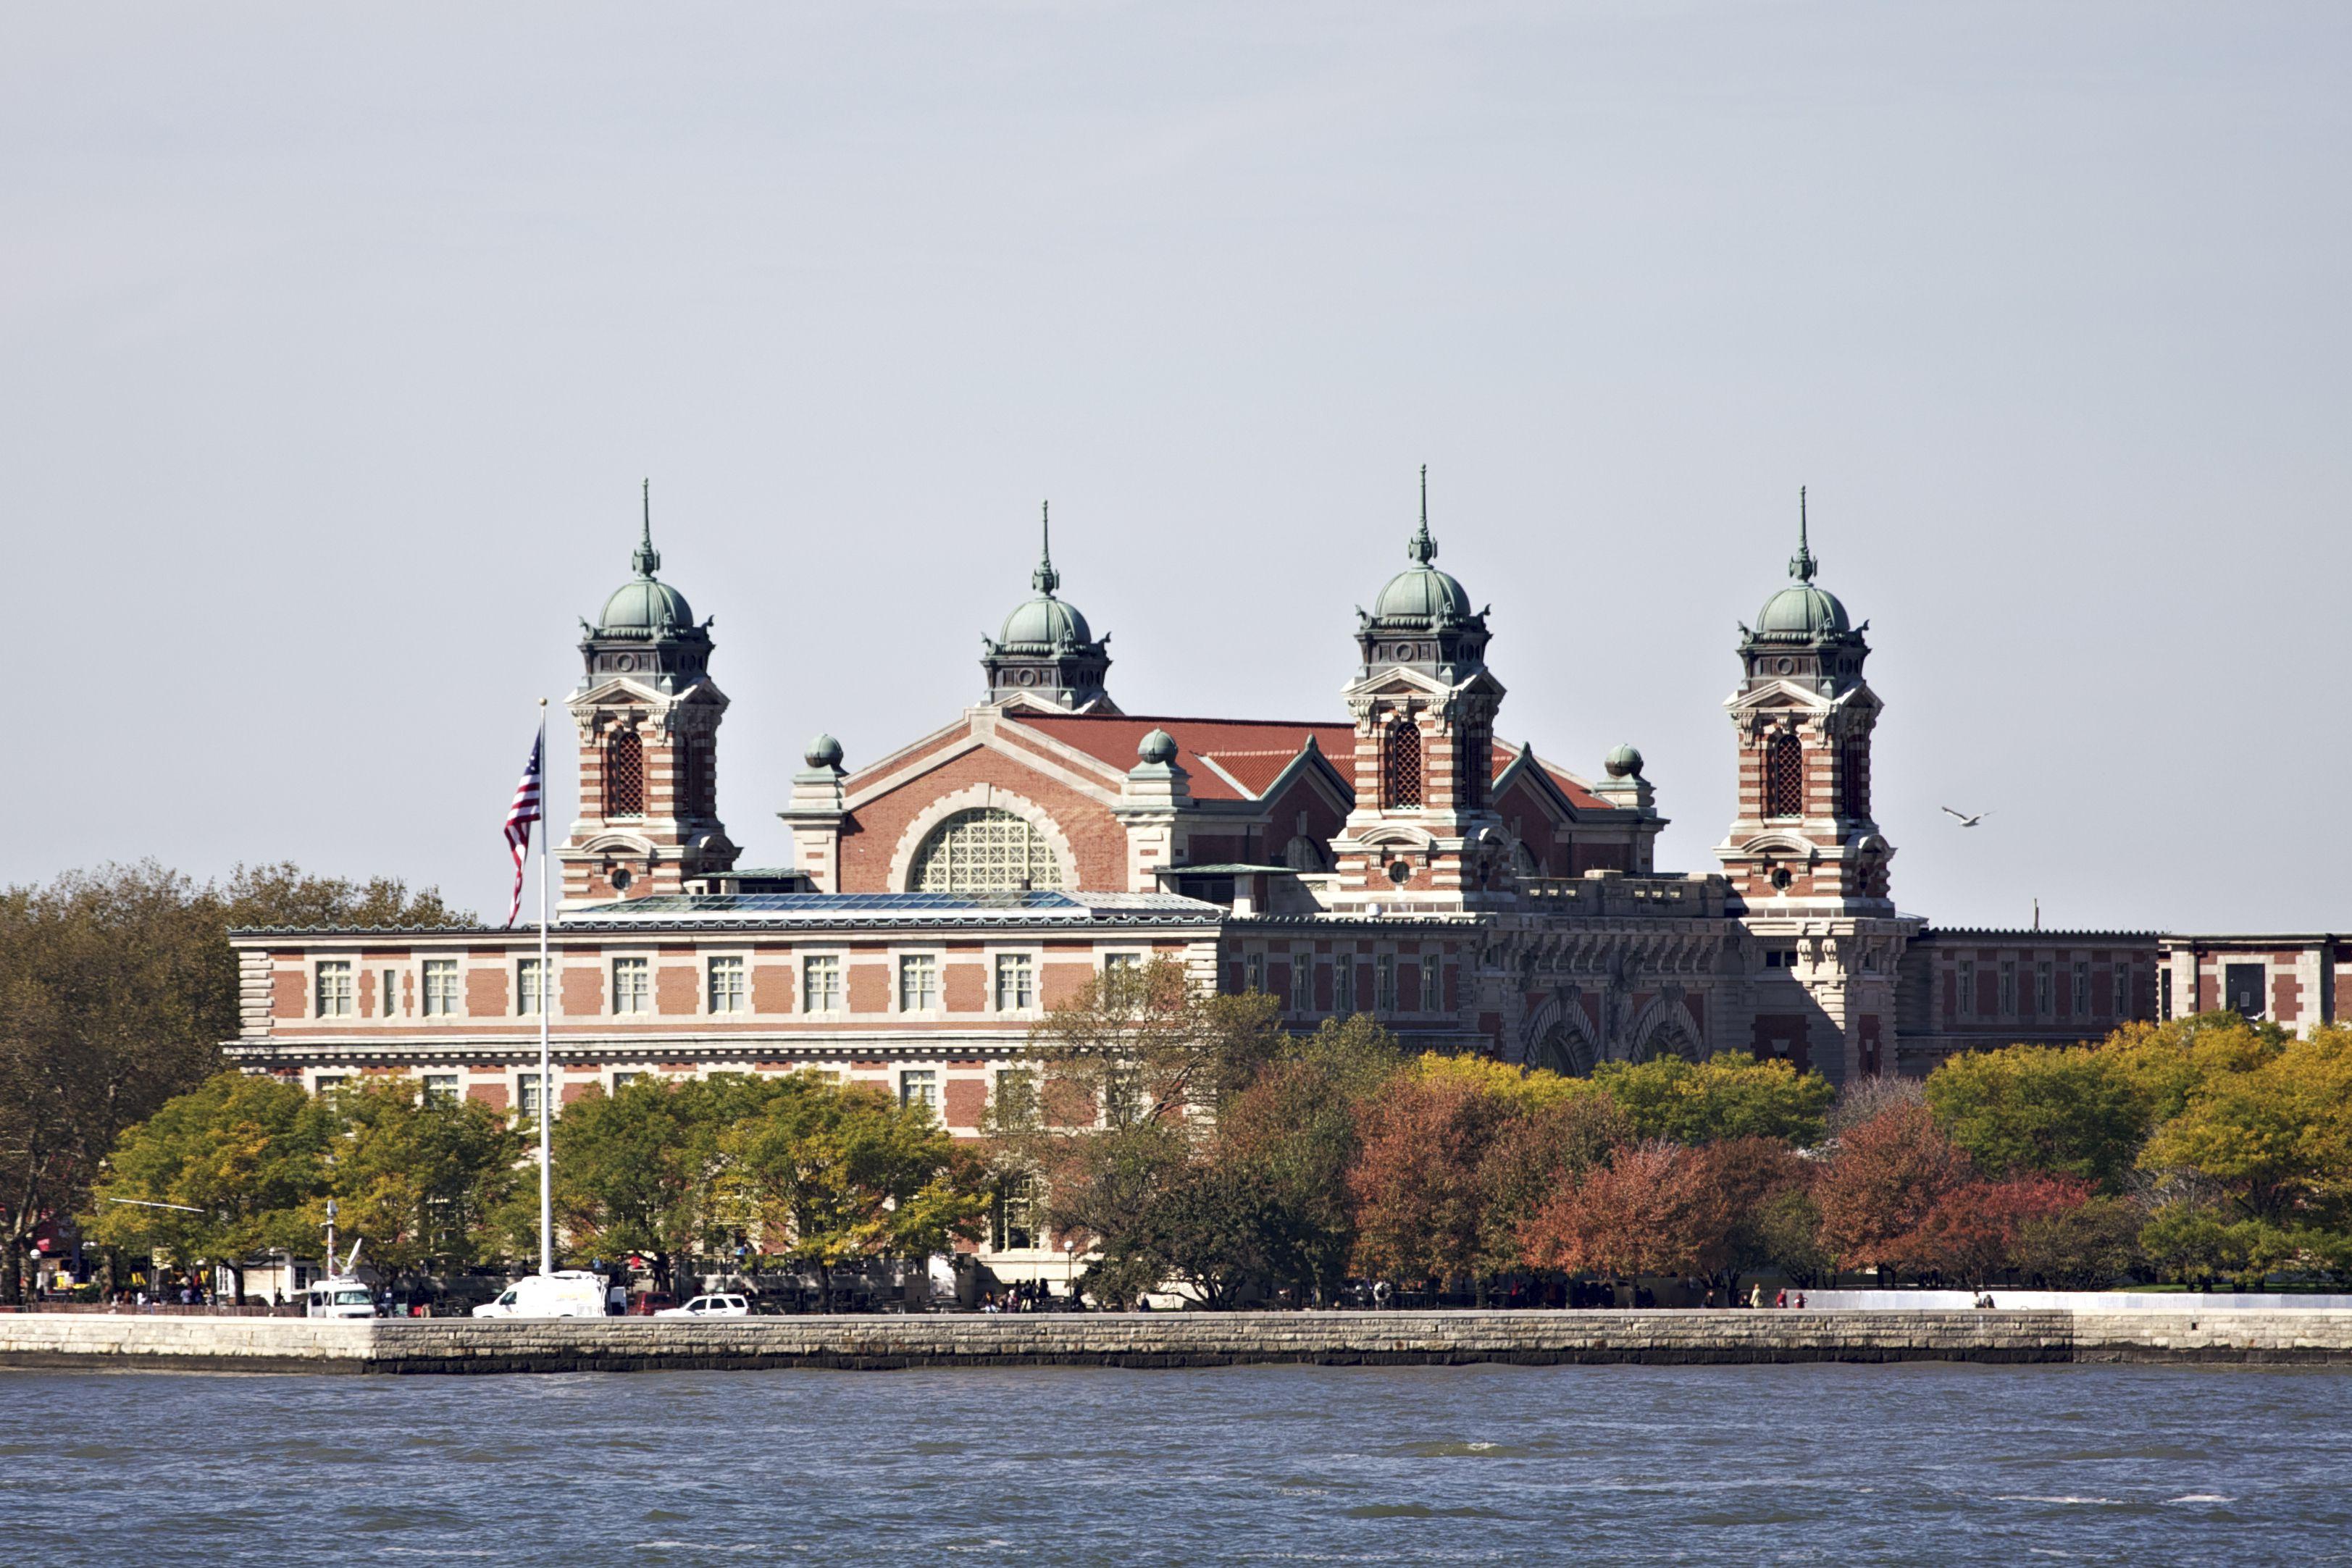 Ellis Island in New York City